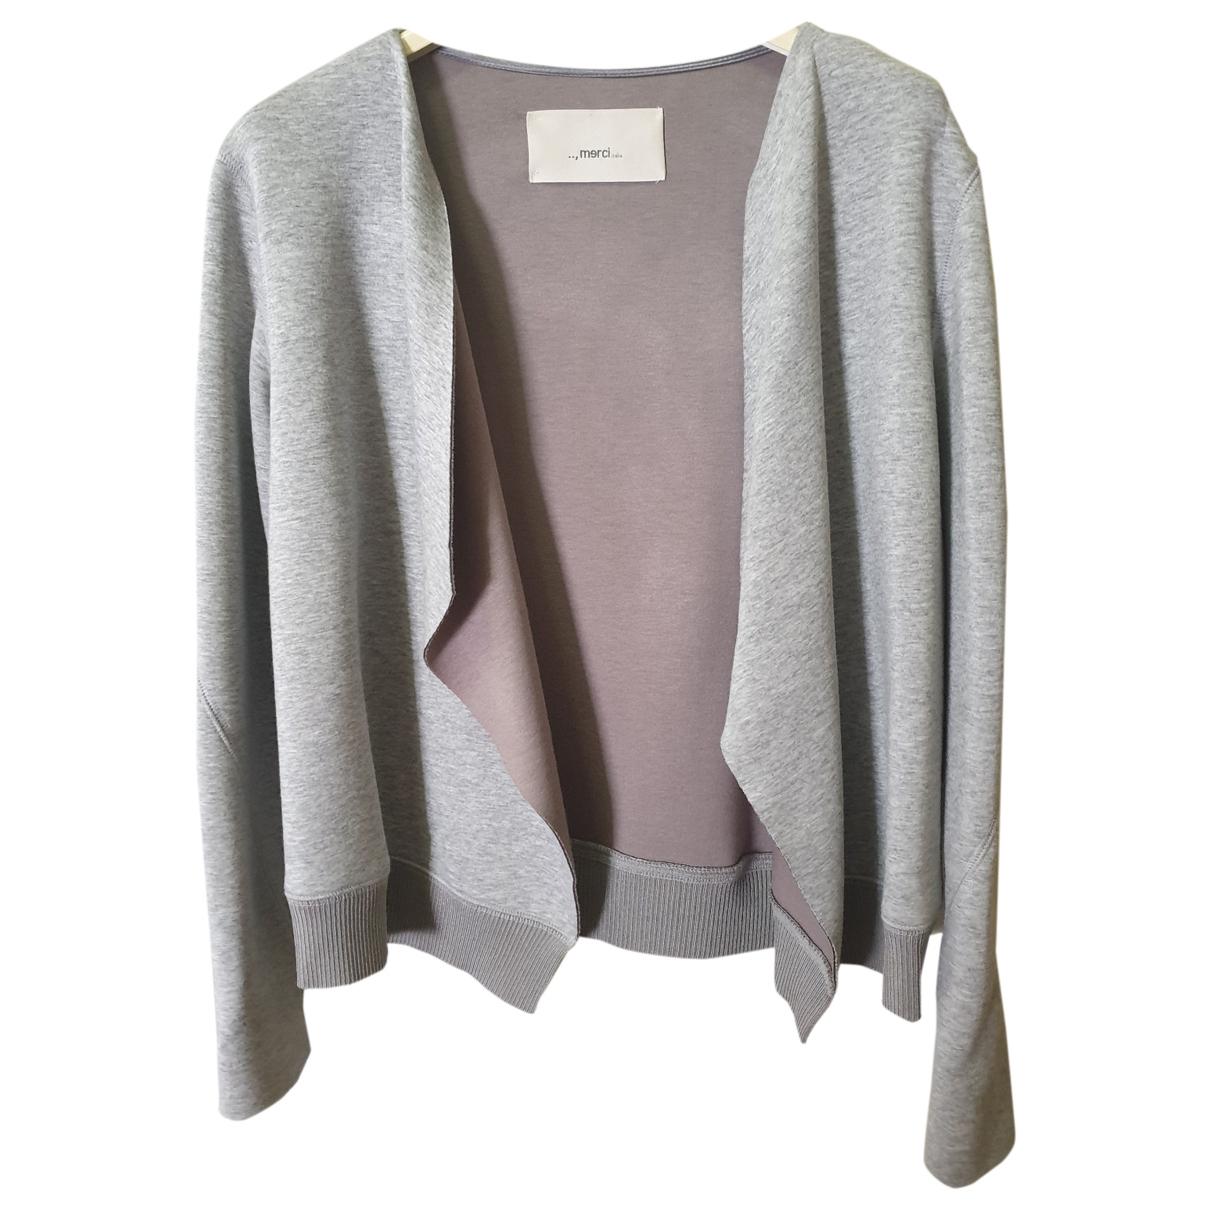 Merci \N Grey jacket for Women M International